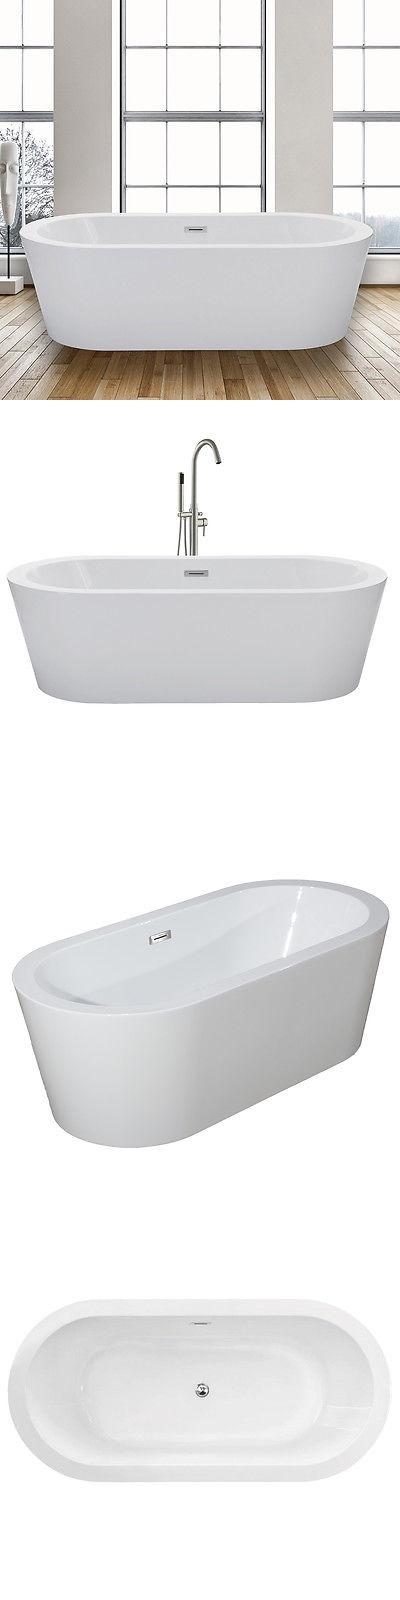 Bathtubs 42025: Woodbridge 67 Freestanding Bathtub B-0002 With ...